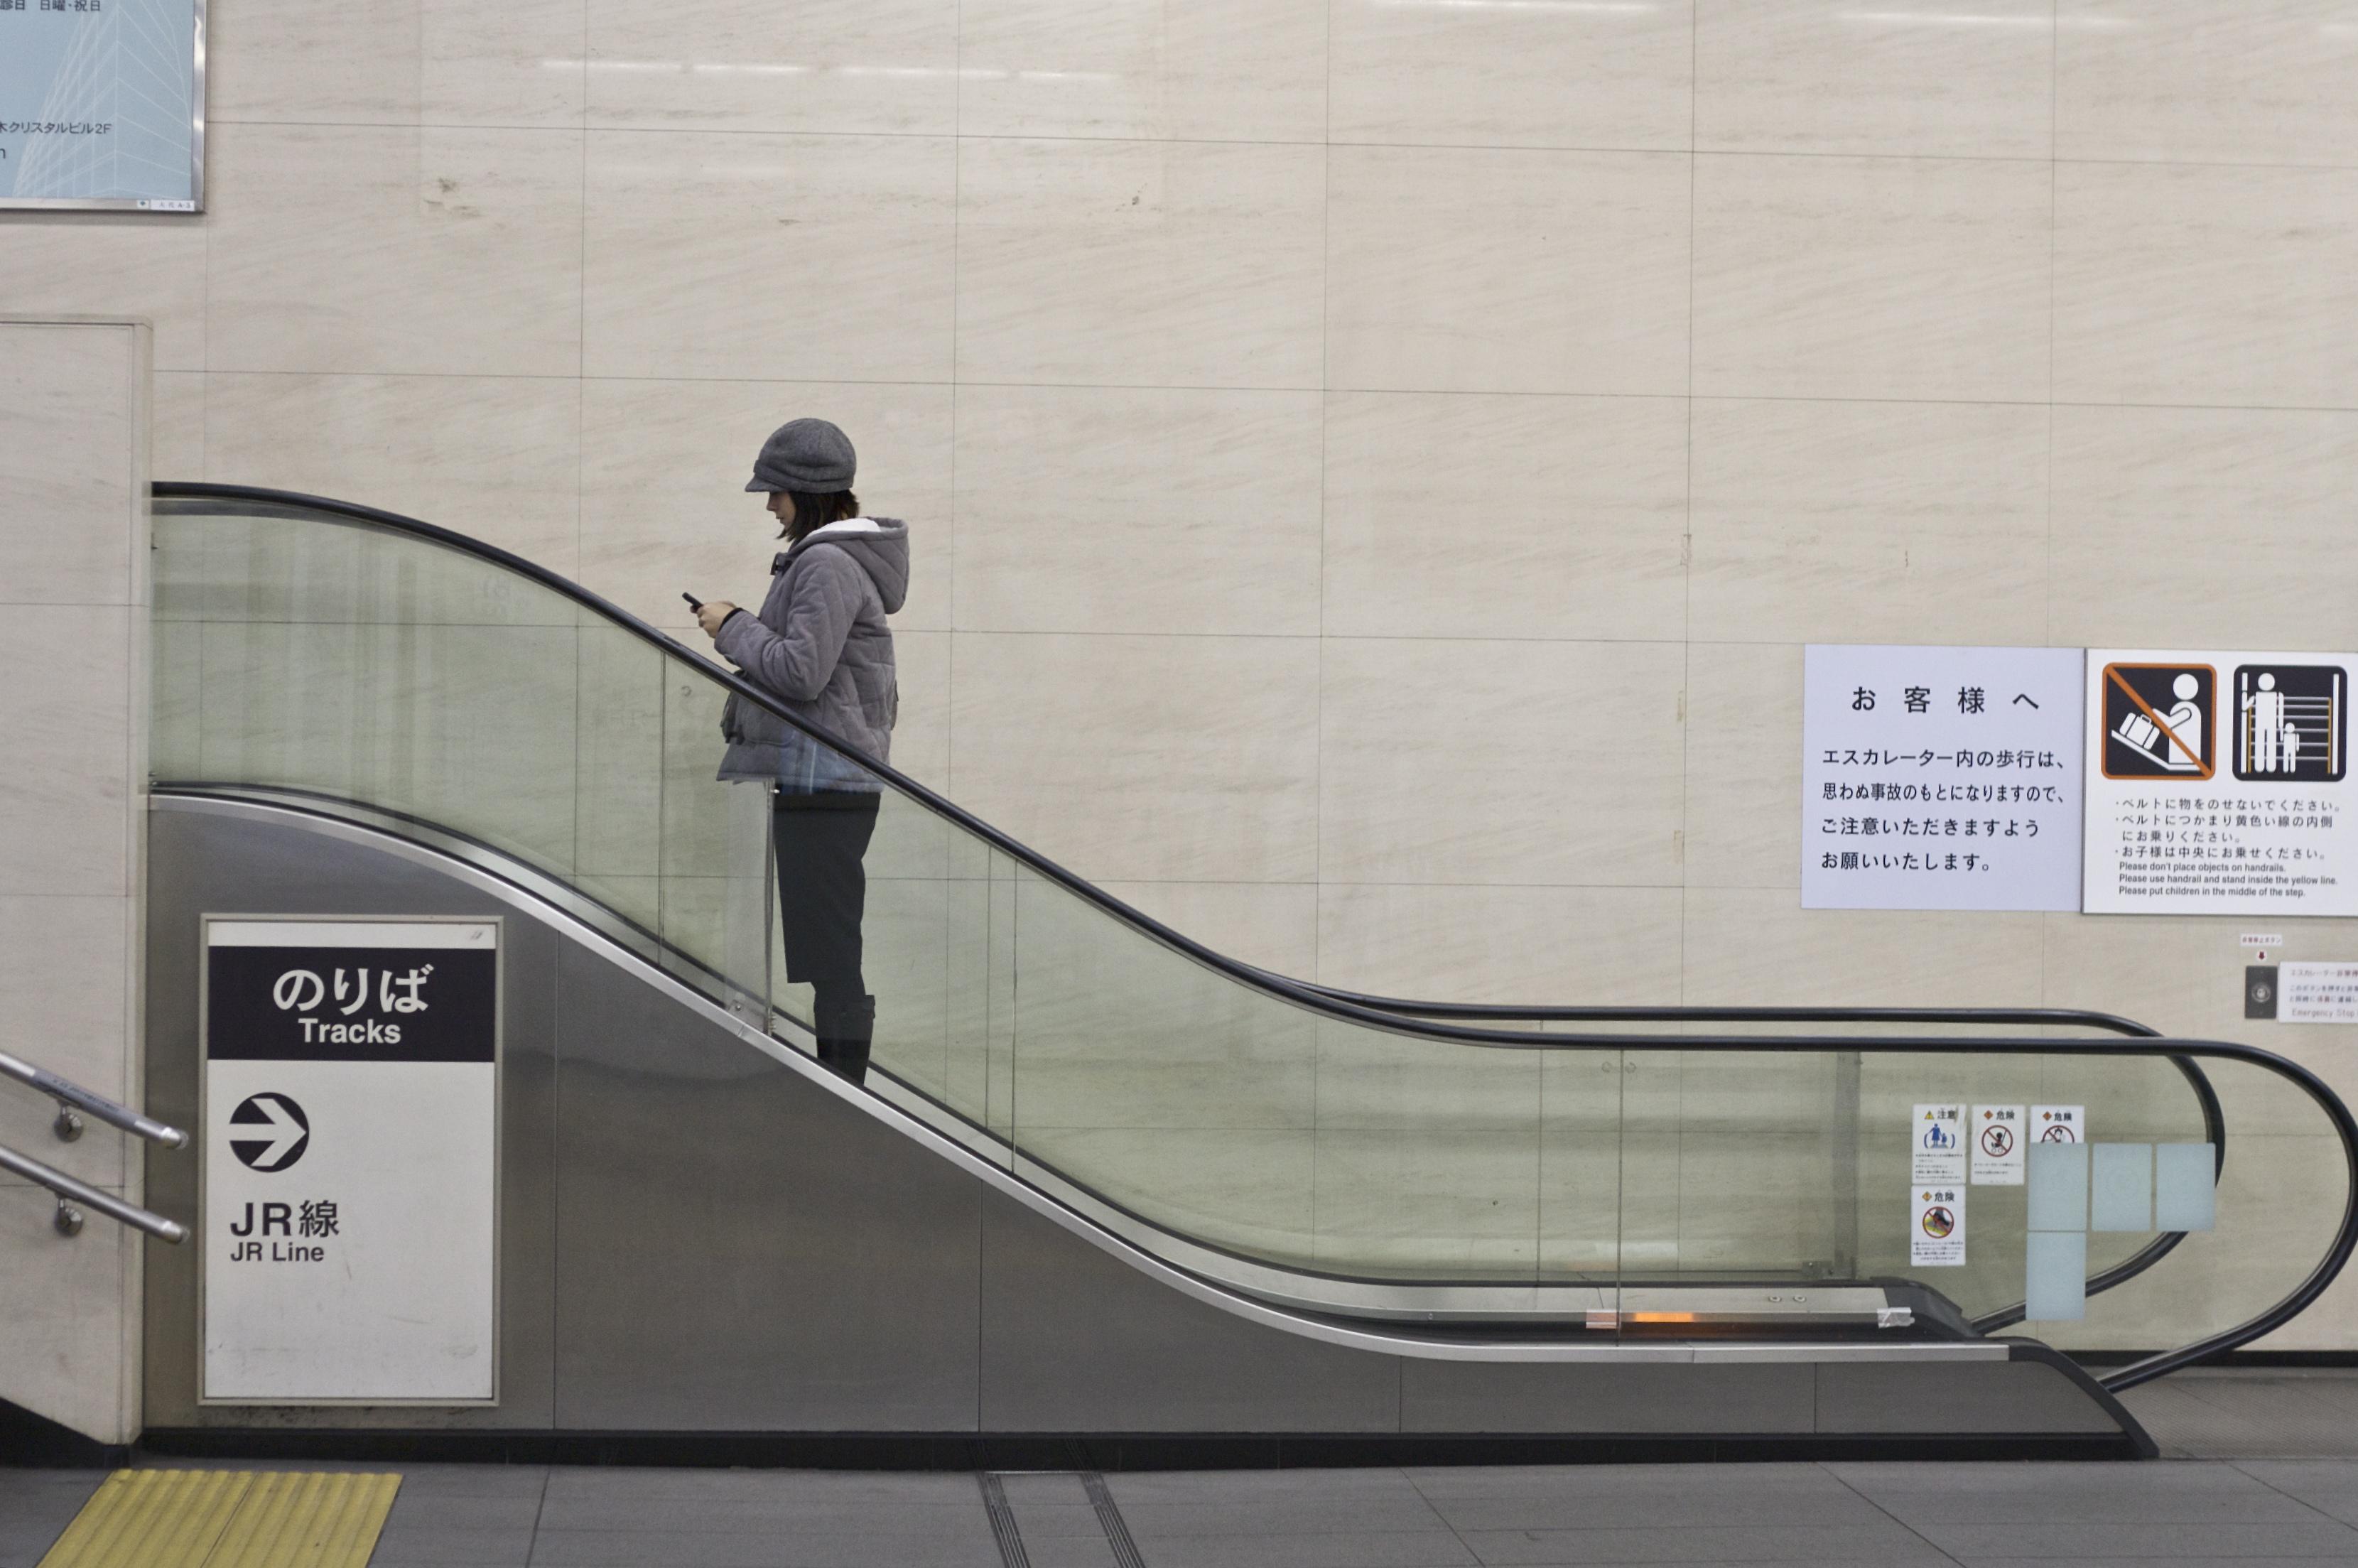 filesmall escalator 4218783525jpg wikimedia commons